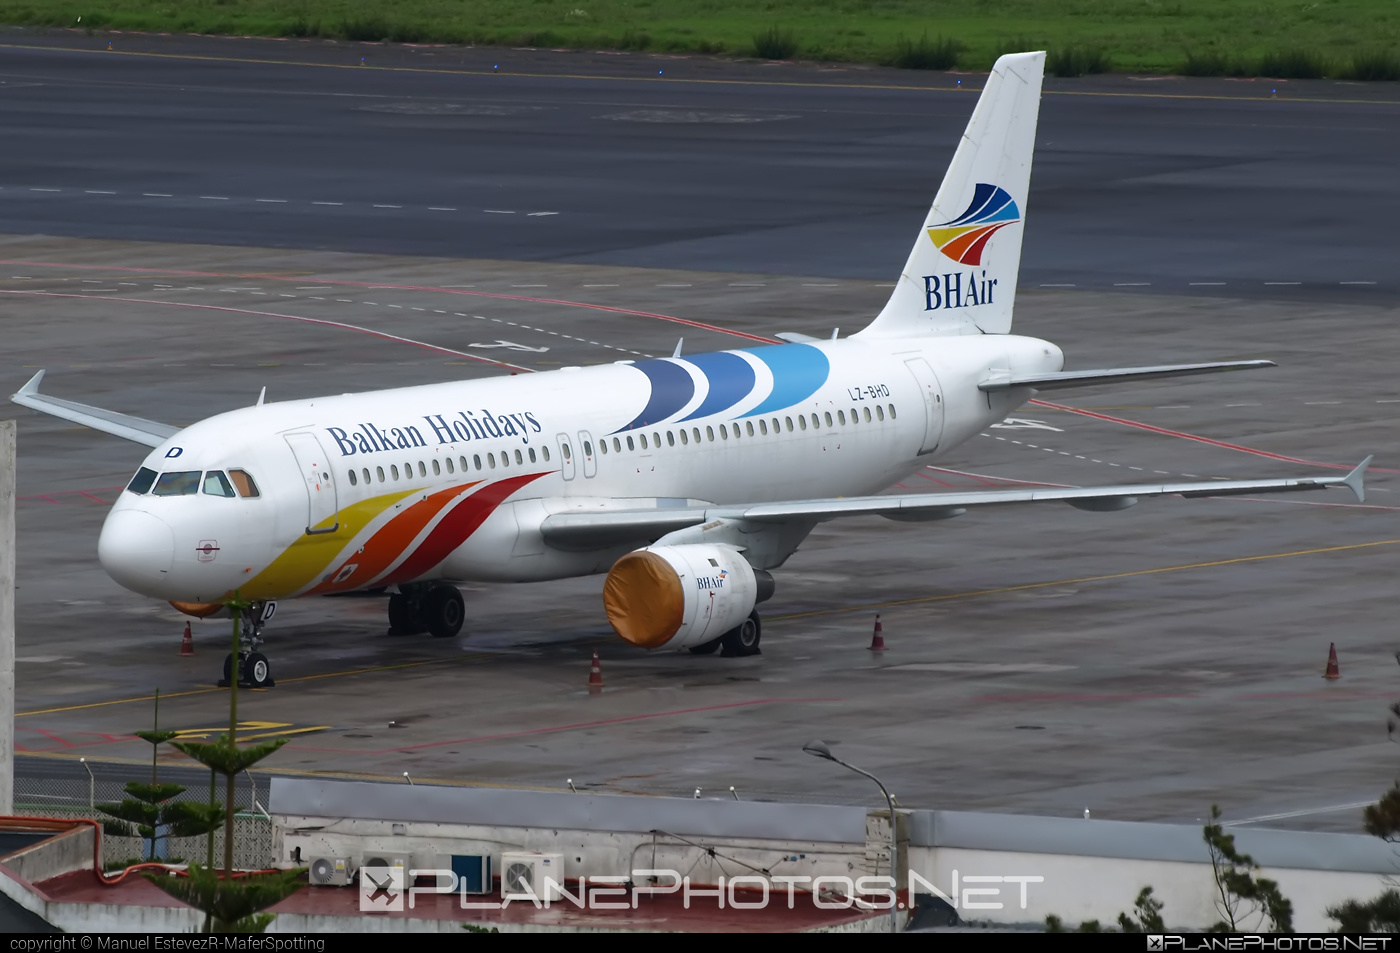 Airbus A320-212 - LZ-BHD operated by BH Air #a320 #a320family #airbus #airbus320 #balkanholidays #bhair